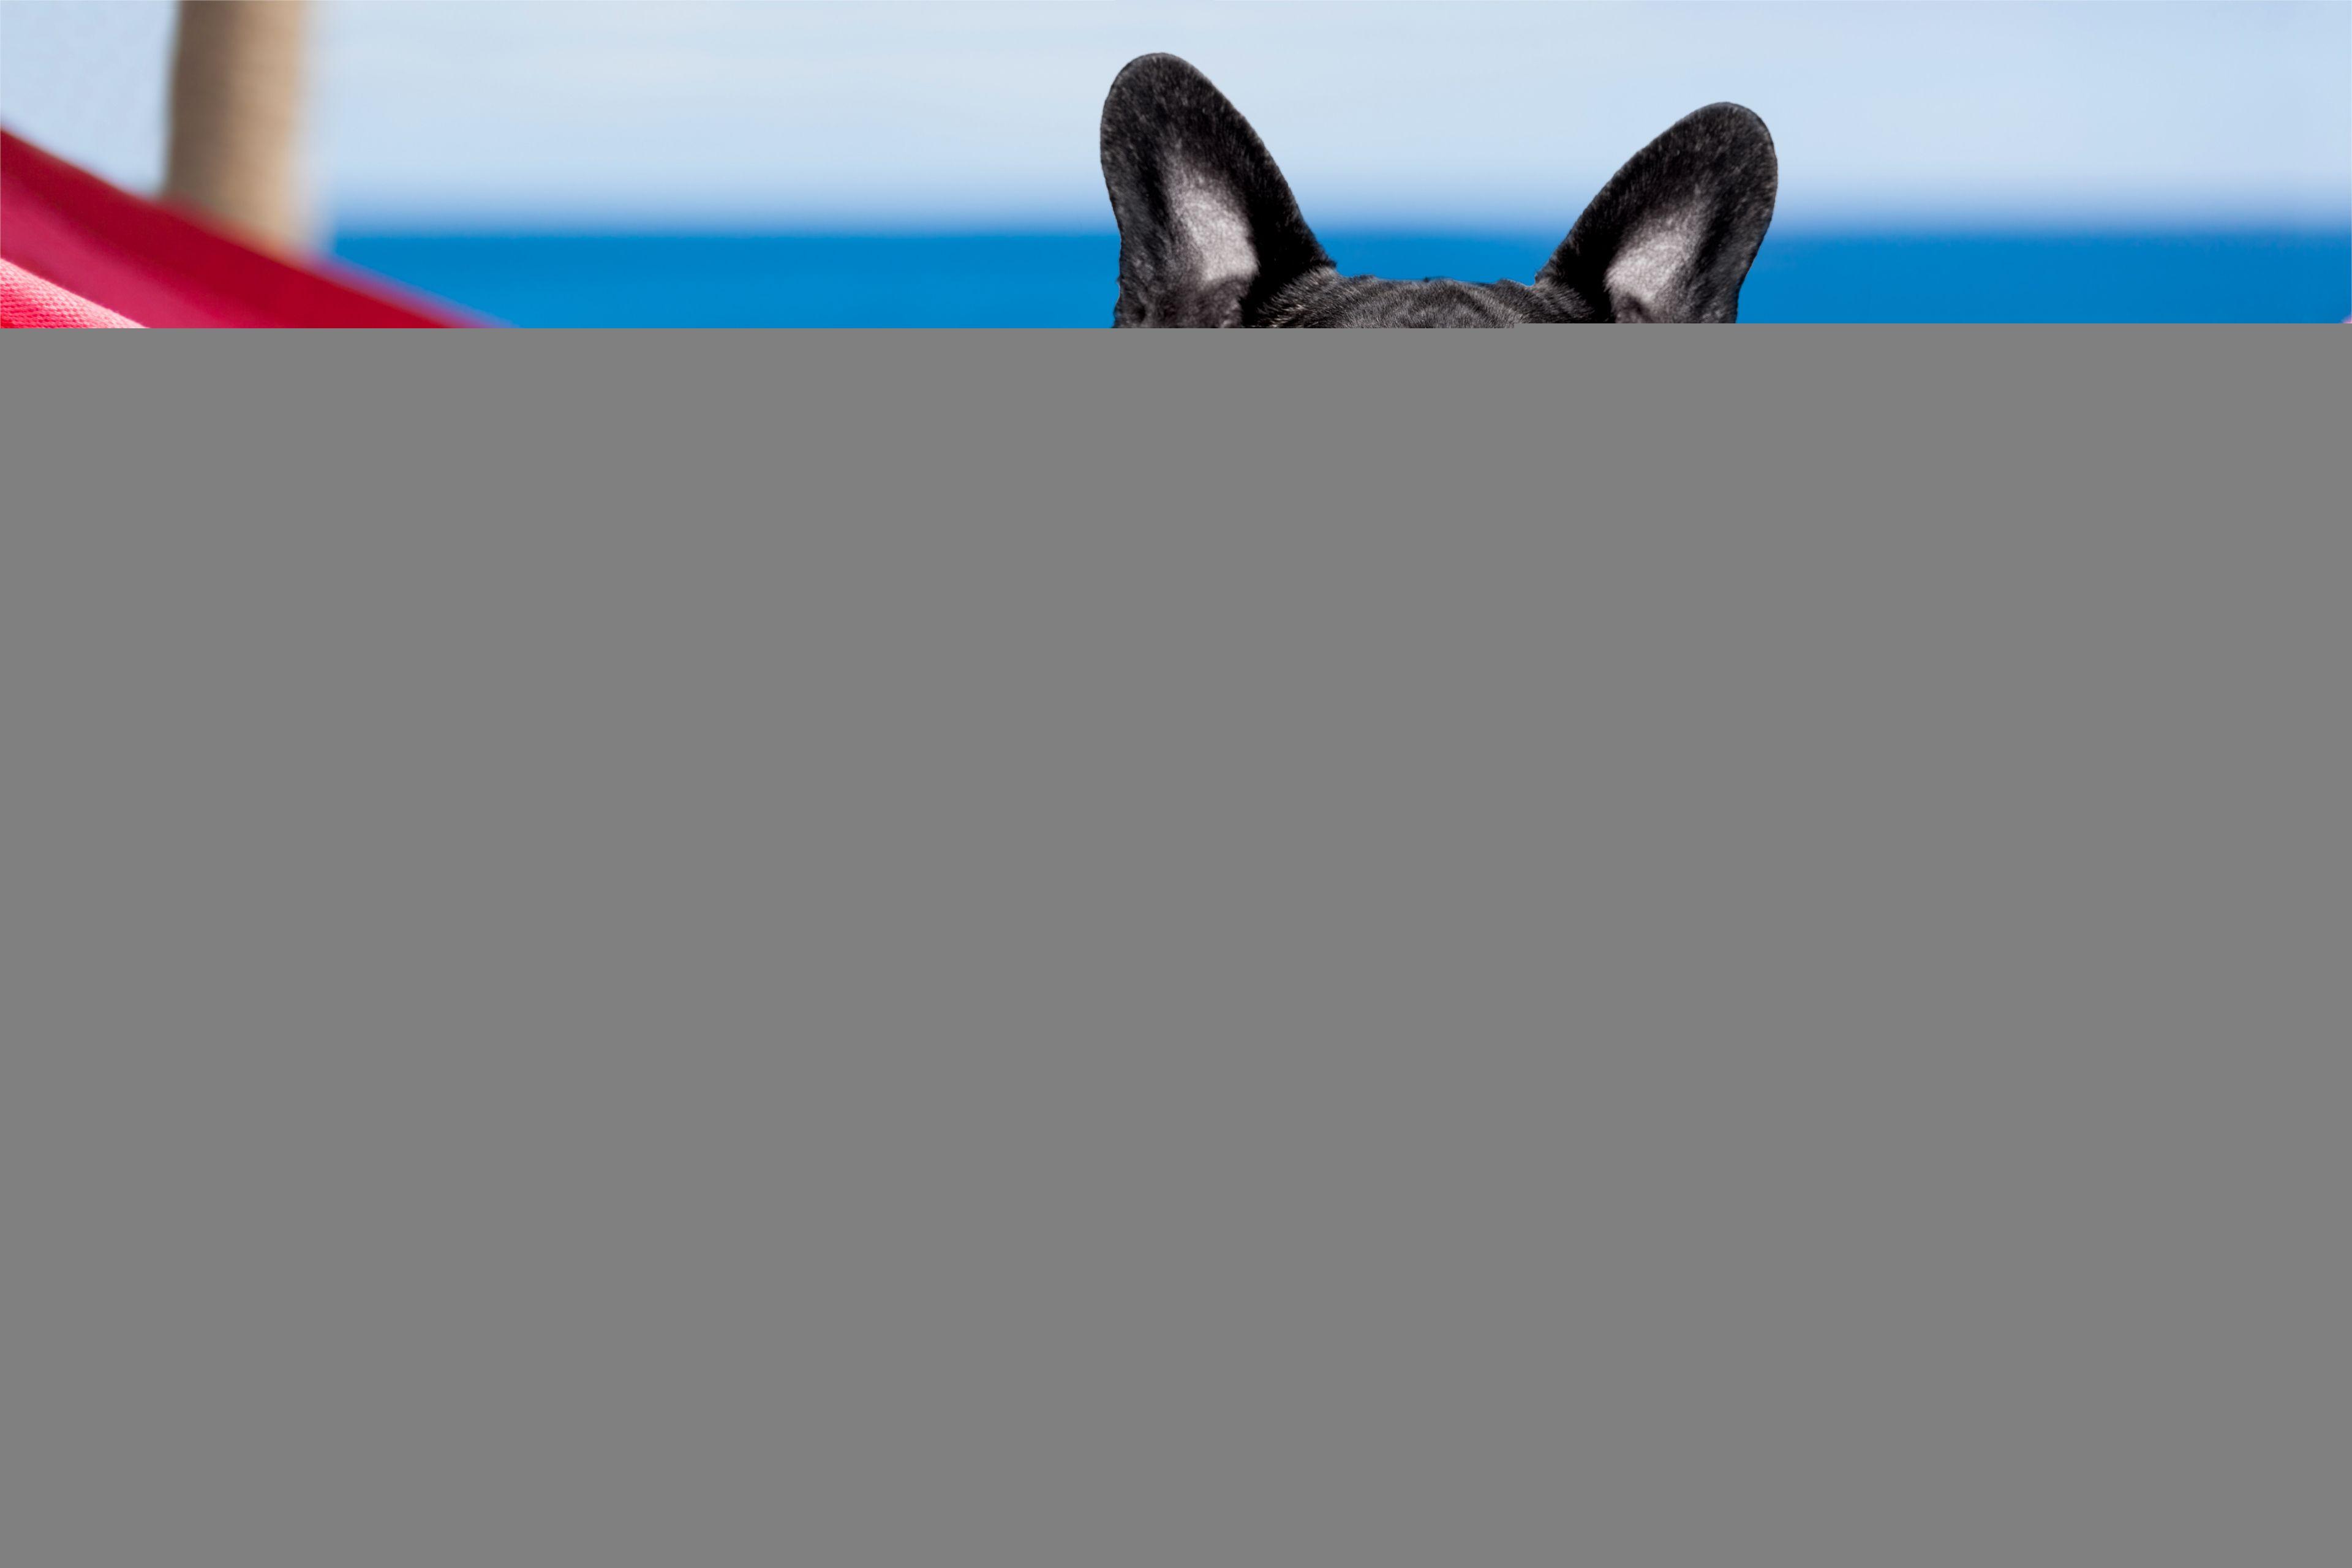 Pies Buldog Francuski Okulary Gazeta Hamak Certapet Emotional Support Dog Dog Travel